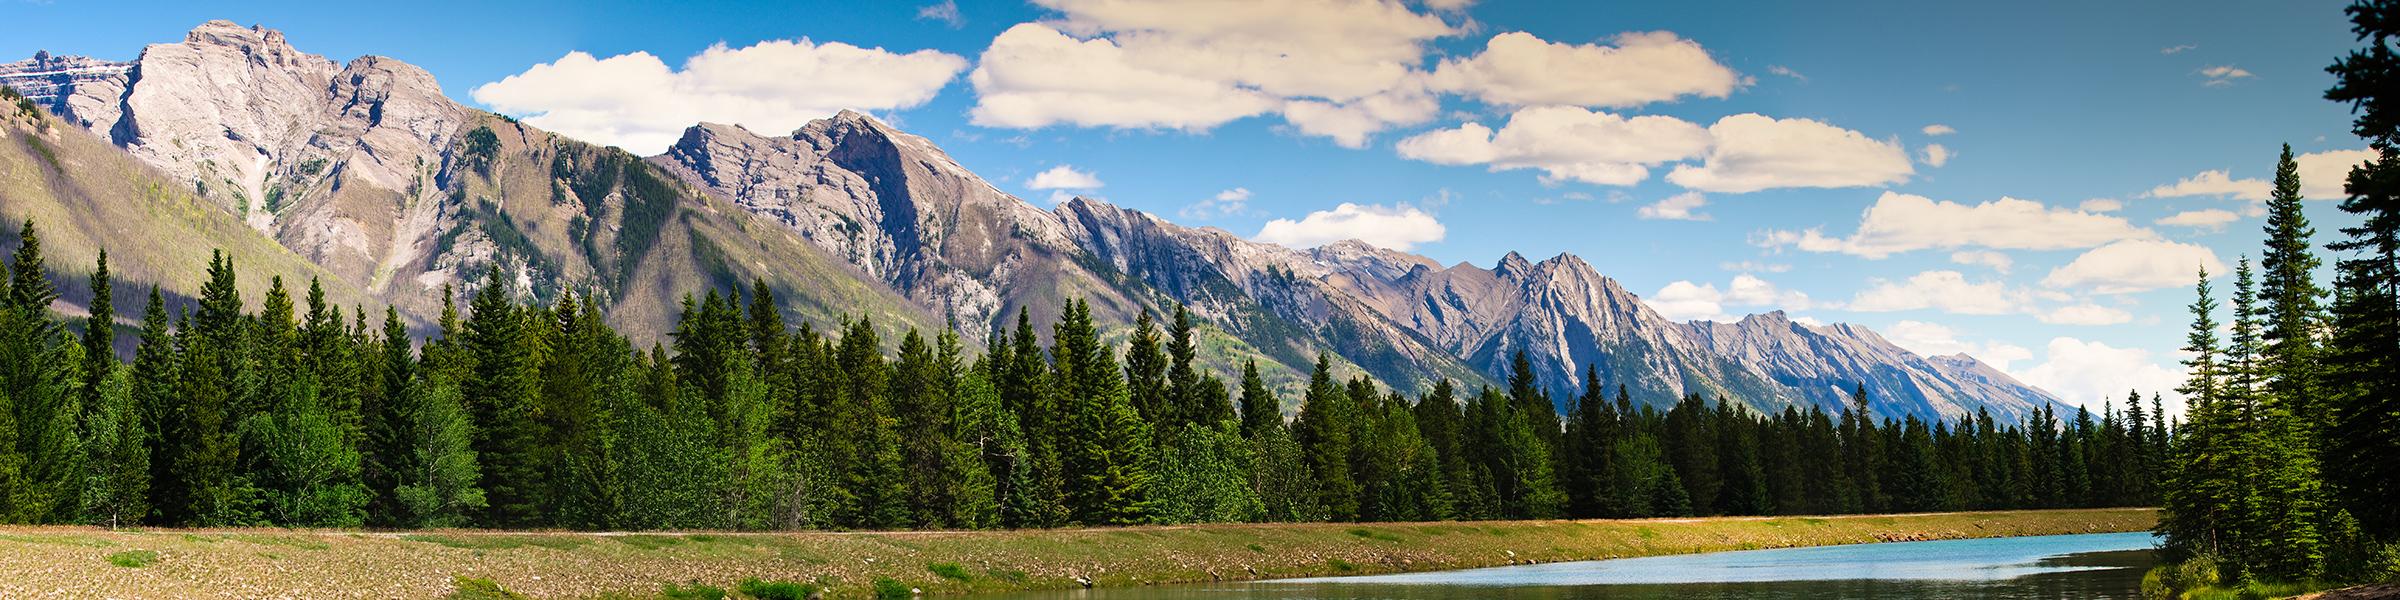 Canada Alberta Banff National Park